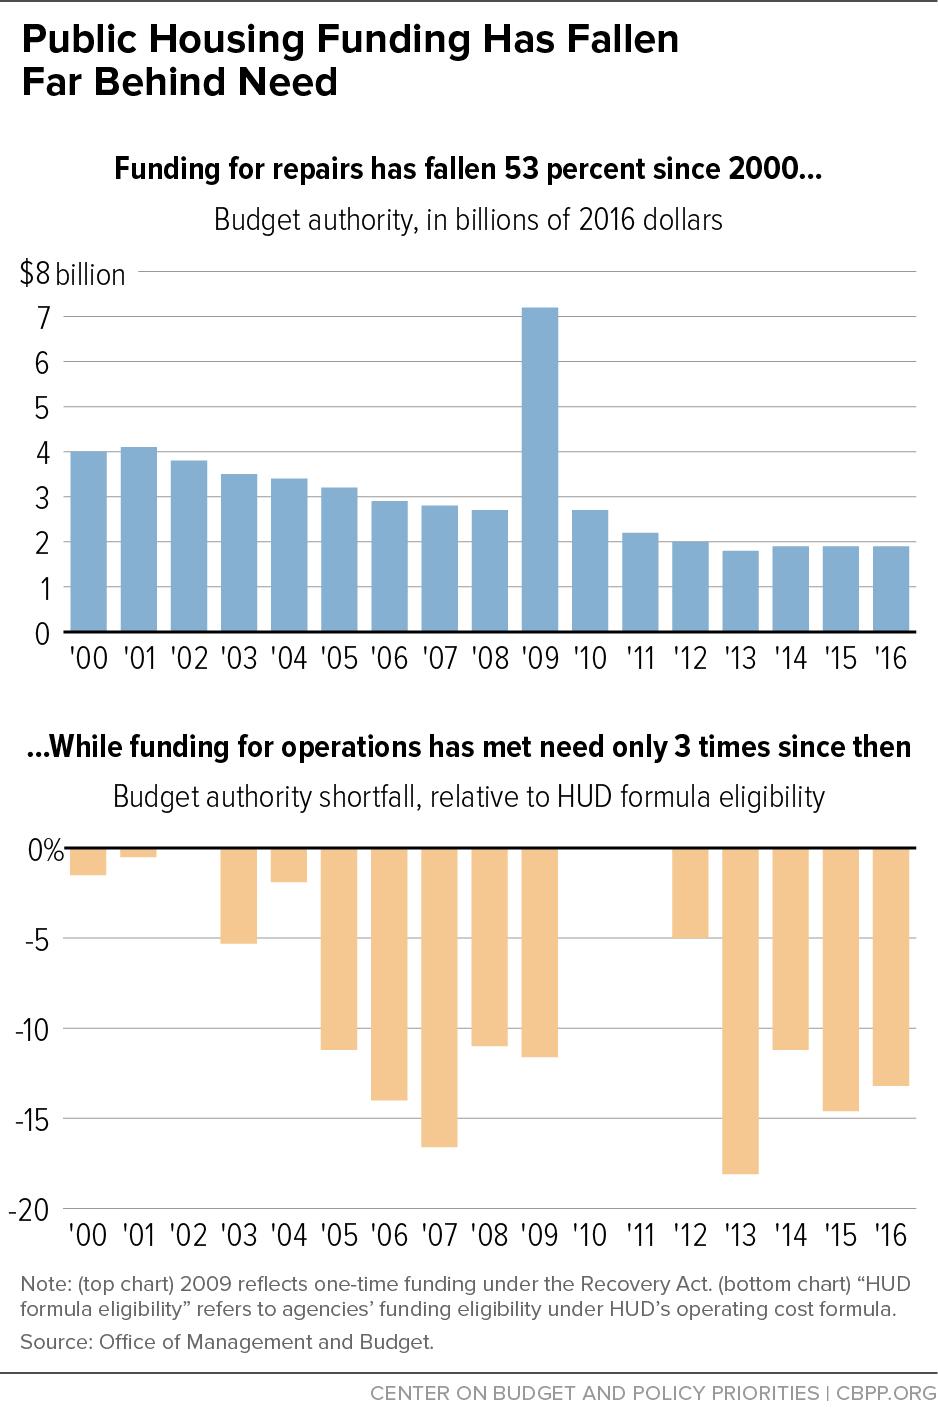 Public Housing Funding Has Fallen Far Behind Need